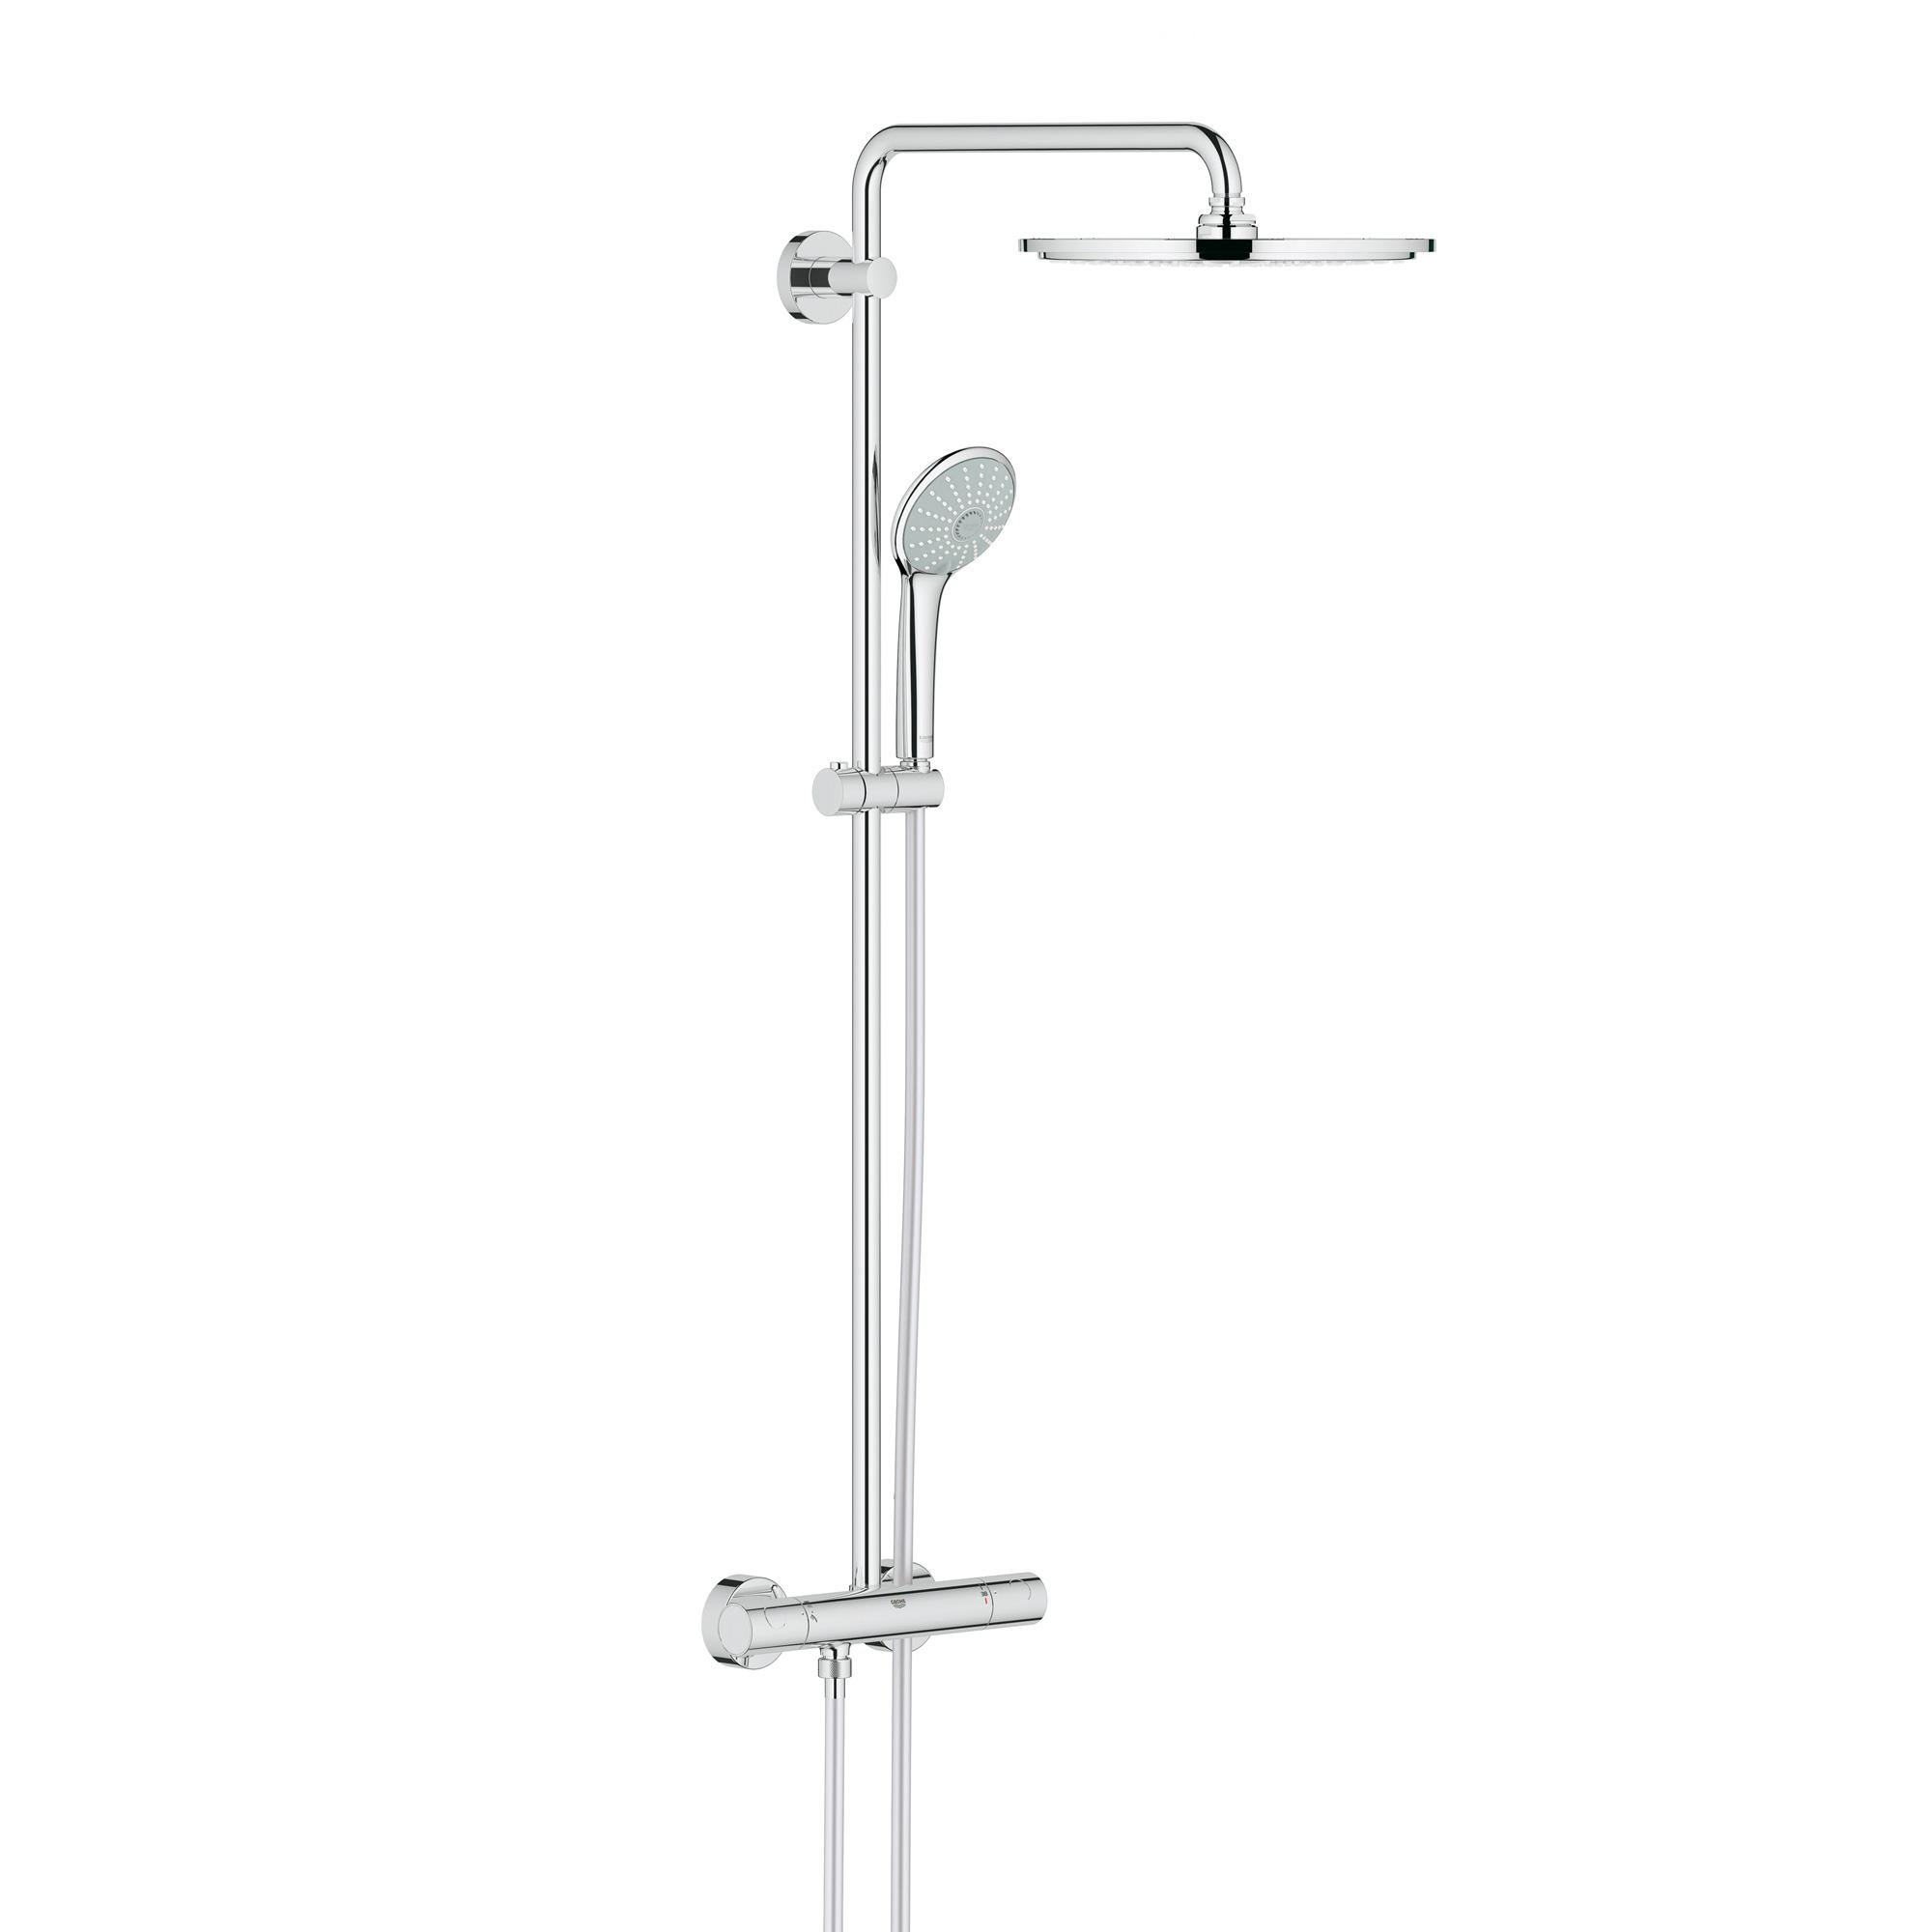 grohe euphoria xxl system 310 duschsystem mit thermostatbatterie f r wandmontage 26075000. Black Bedroom Furniture Sets. Home Design Ideas